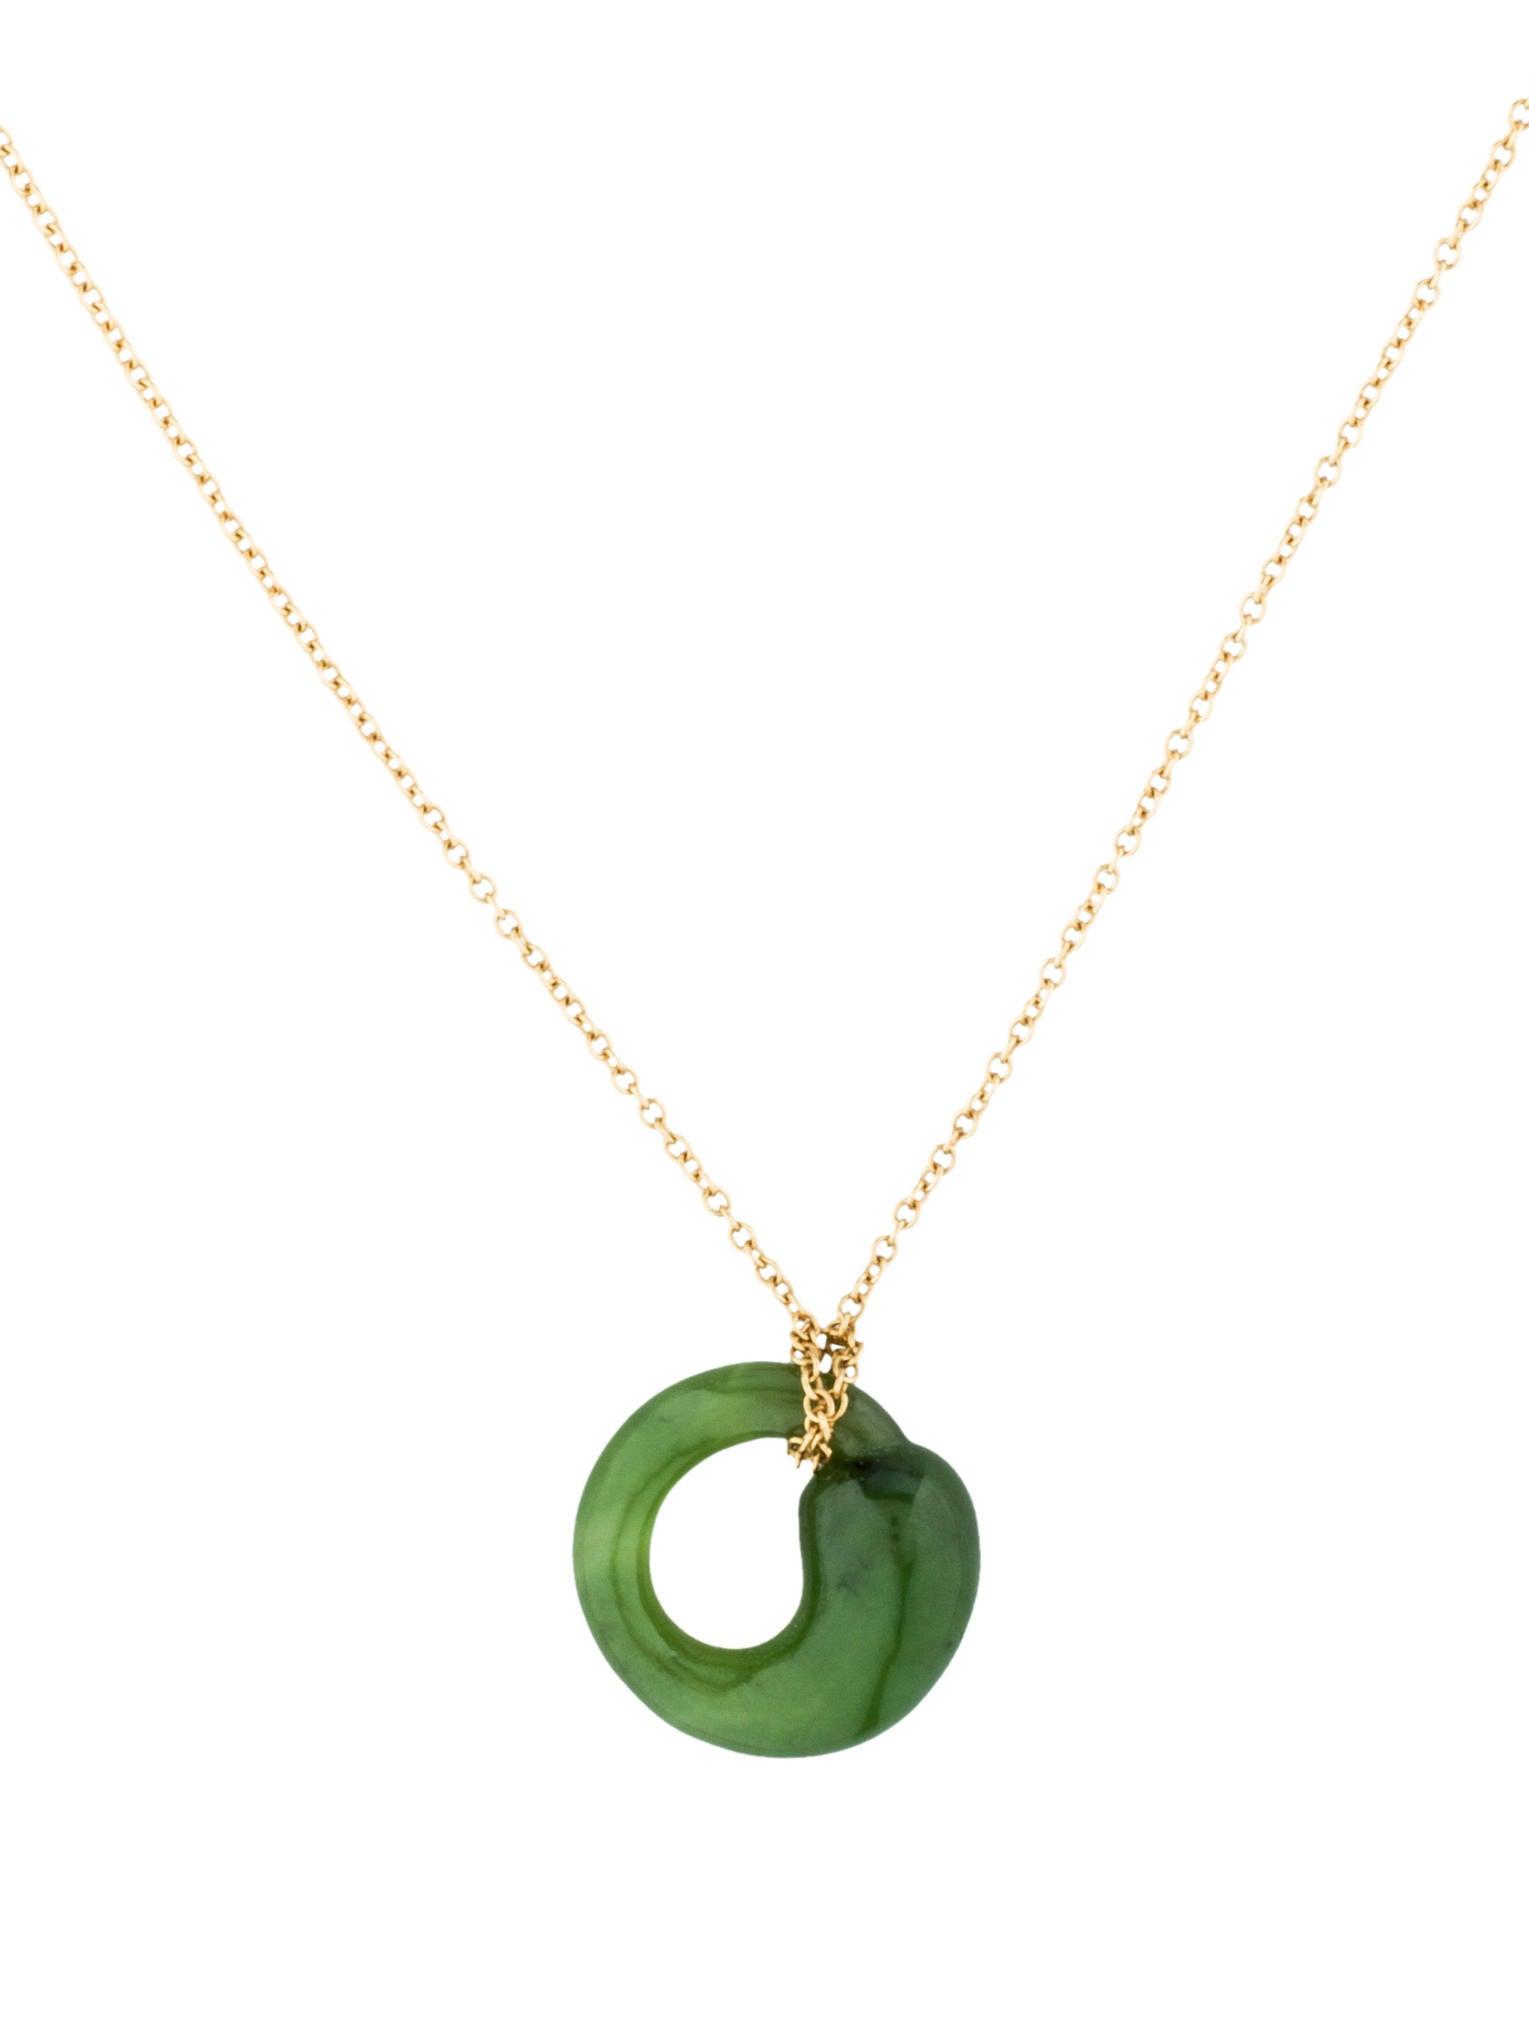 Tiffany co jade eternal circle pendant necklace necklaces jade eternal circle pendant necklace mozeypictures Gallery